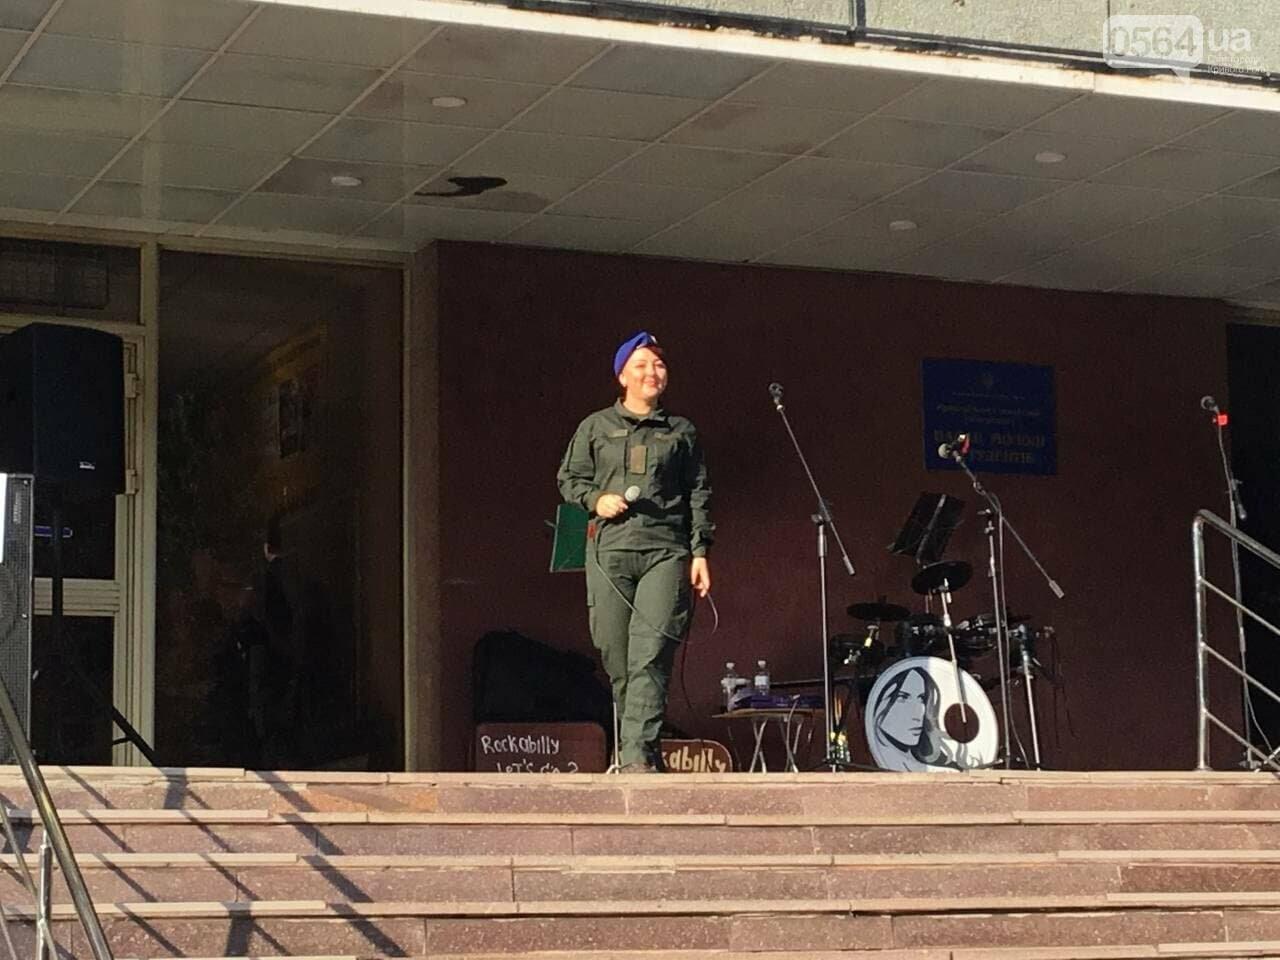 18 конкурсантов представили своё творчество на 5-м Криворожском фестивале имени Кузьмы Скрябина, - ФОТО, ВИДЕО, фото-10